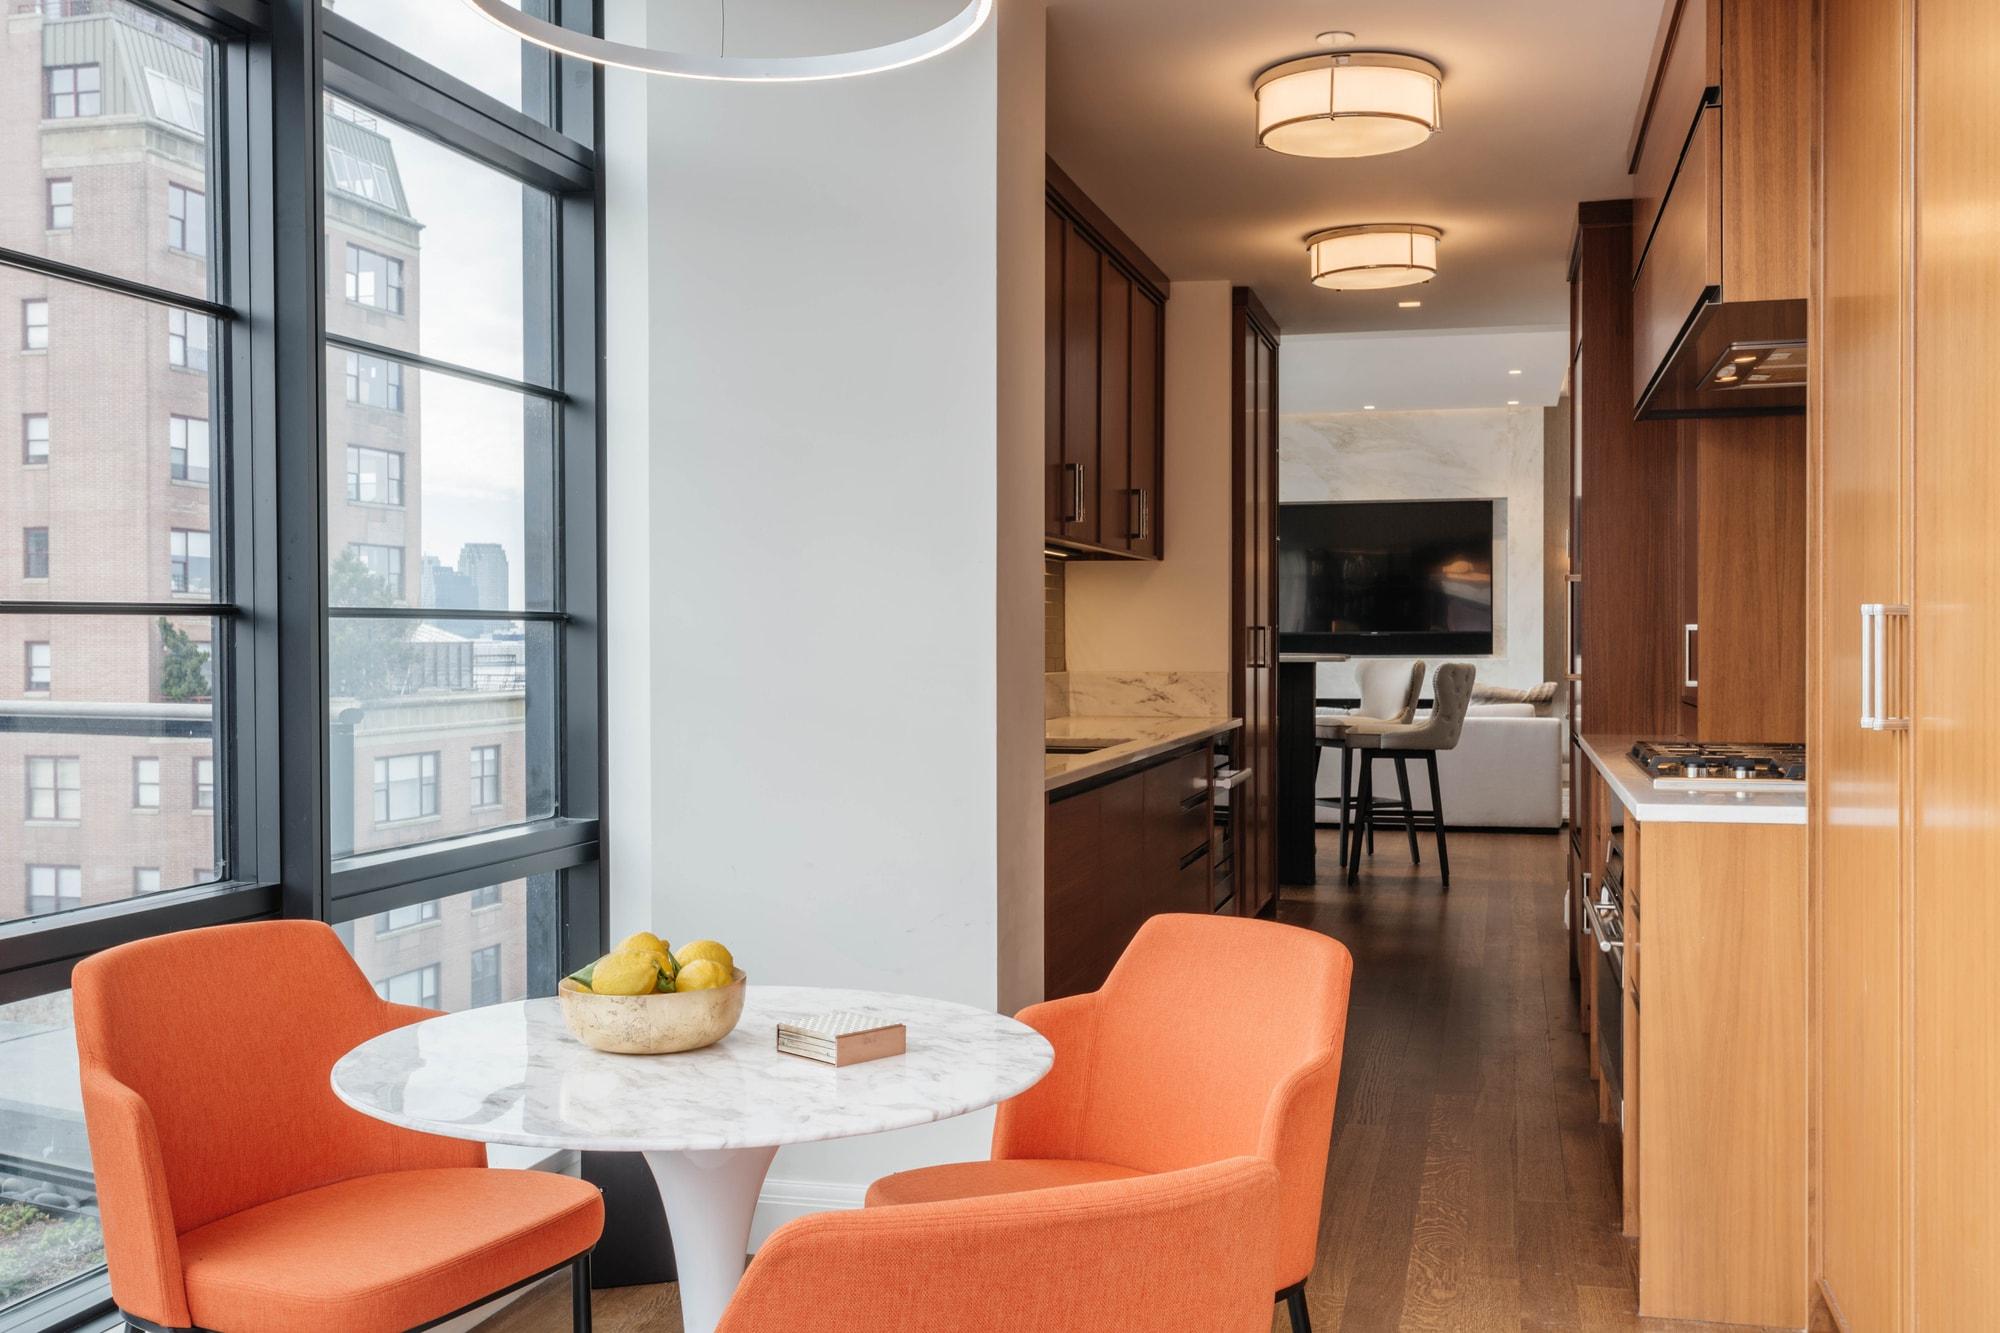 Bright breakfast nook with orange chairs